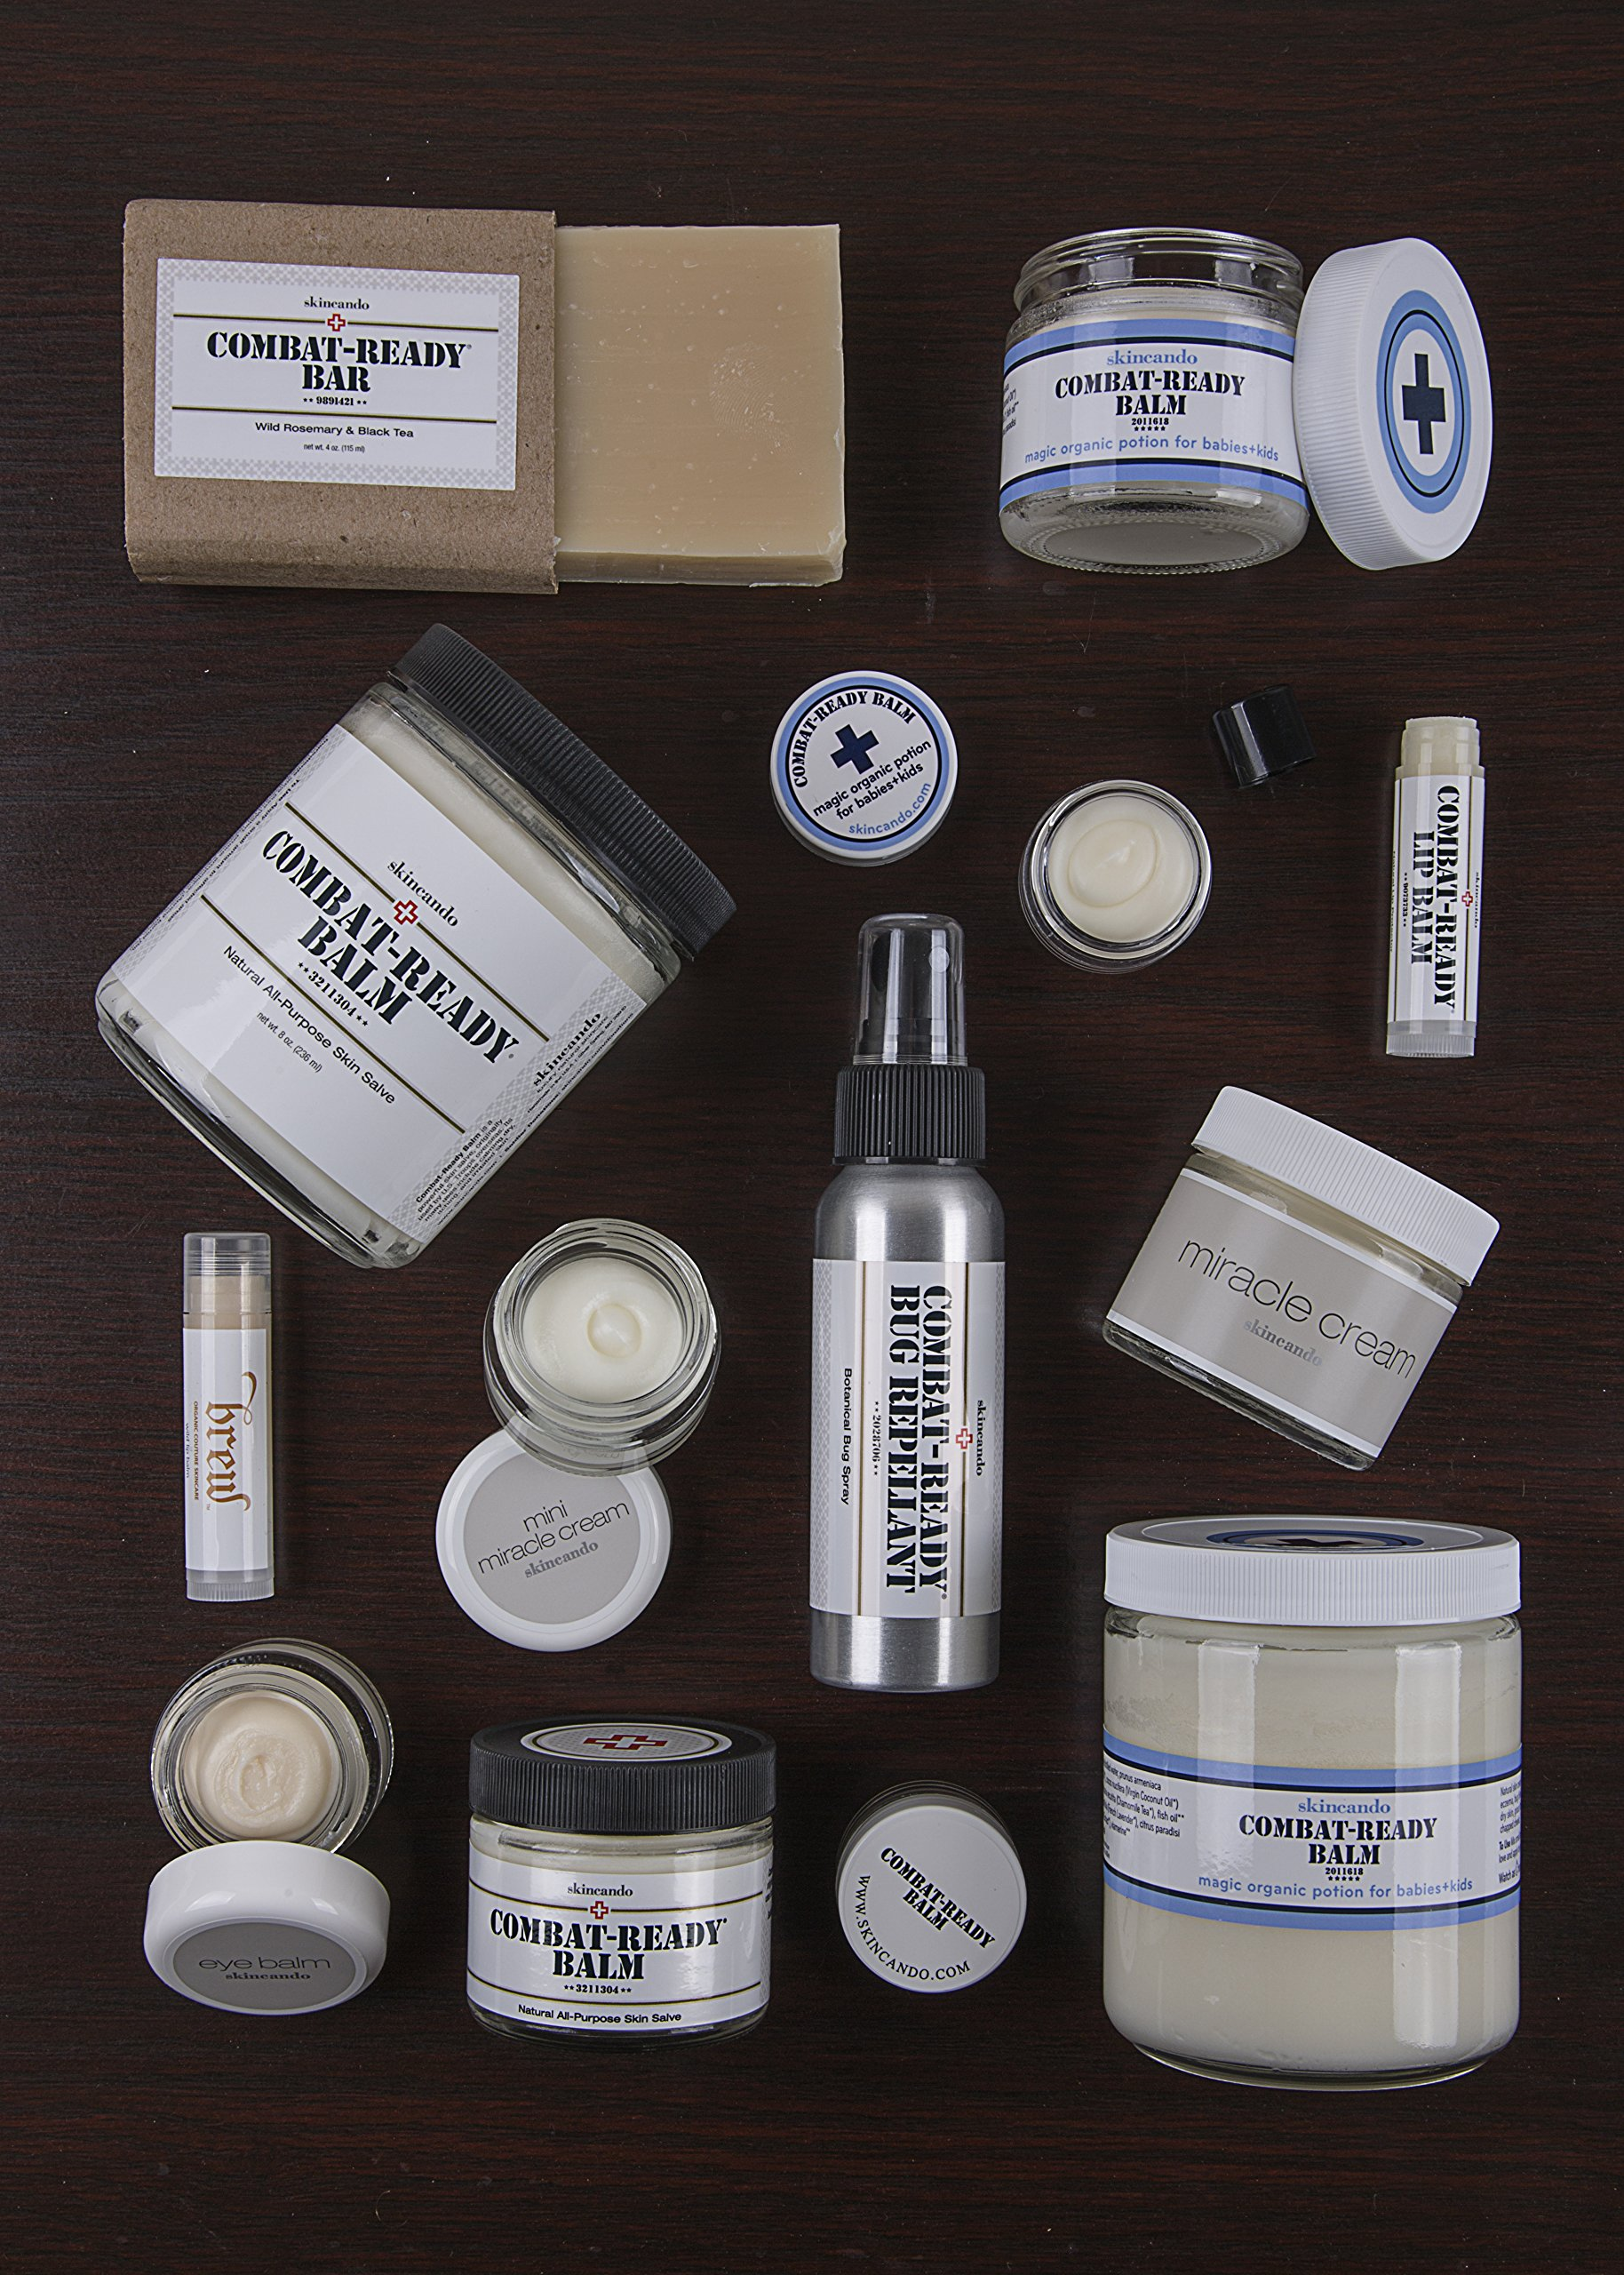 Combat Ready Skin Balm 8oz by Skincando - All Natural - Intensive Moisturizer - Skin Cream - Organic ingredients - Apricot Kernel Oil - Grapefruit Seed Extract - Black Spruce - Black tea Moisturizer